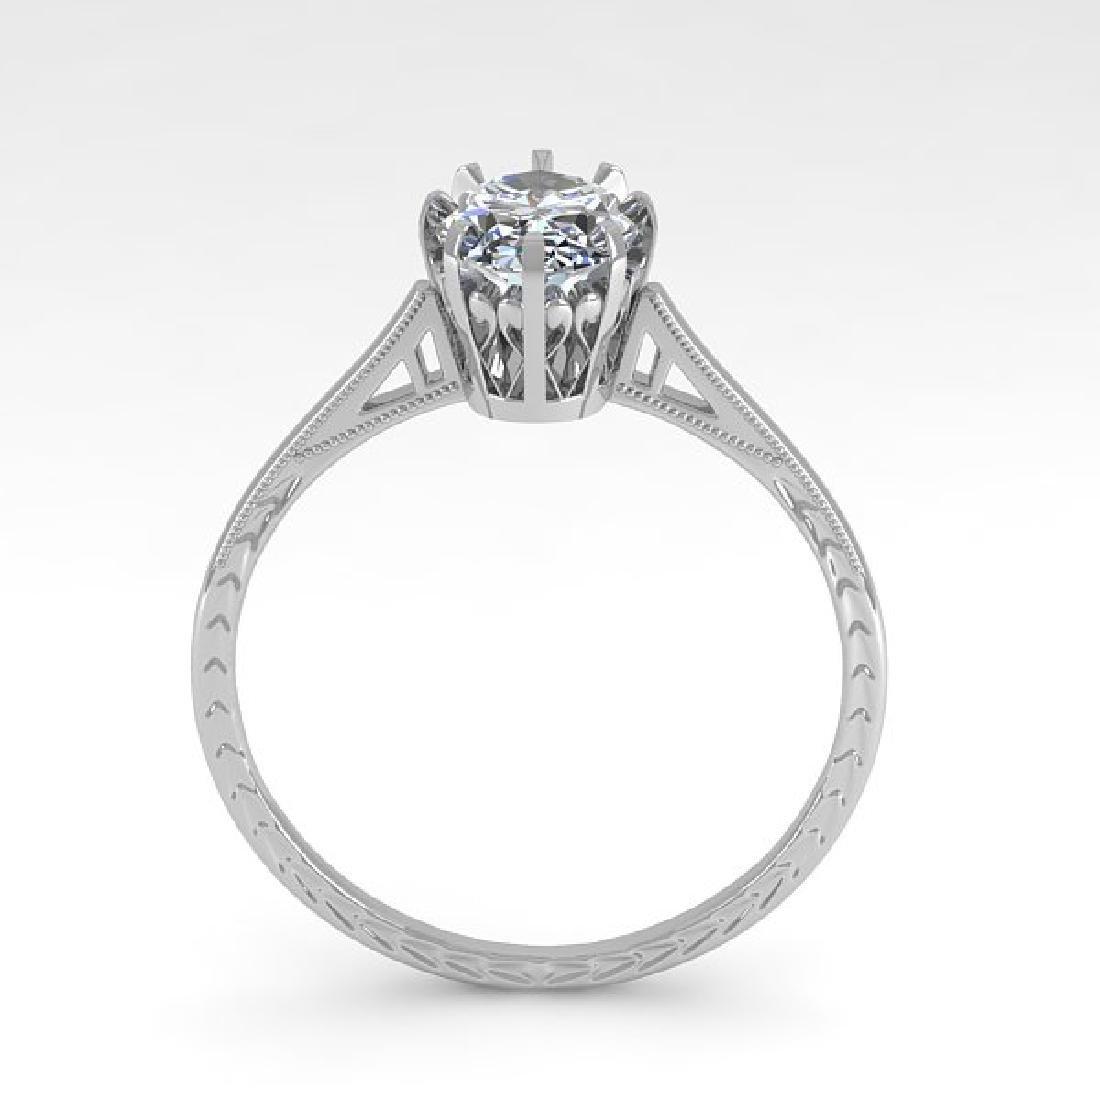 1.0 CTW VS/SI Oval Diamond Solitaire Ring 14K White - 3